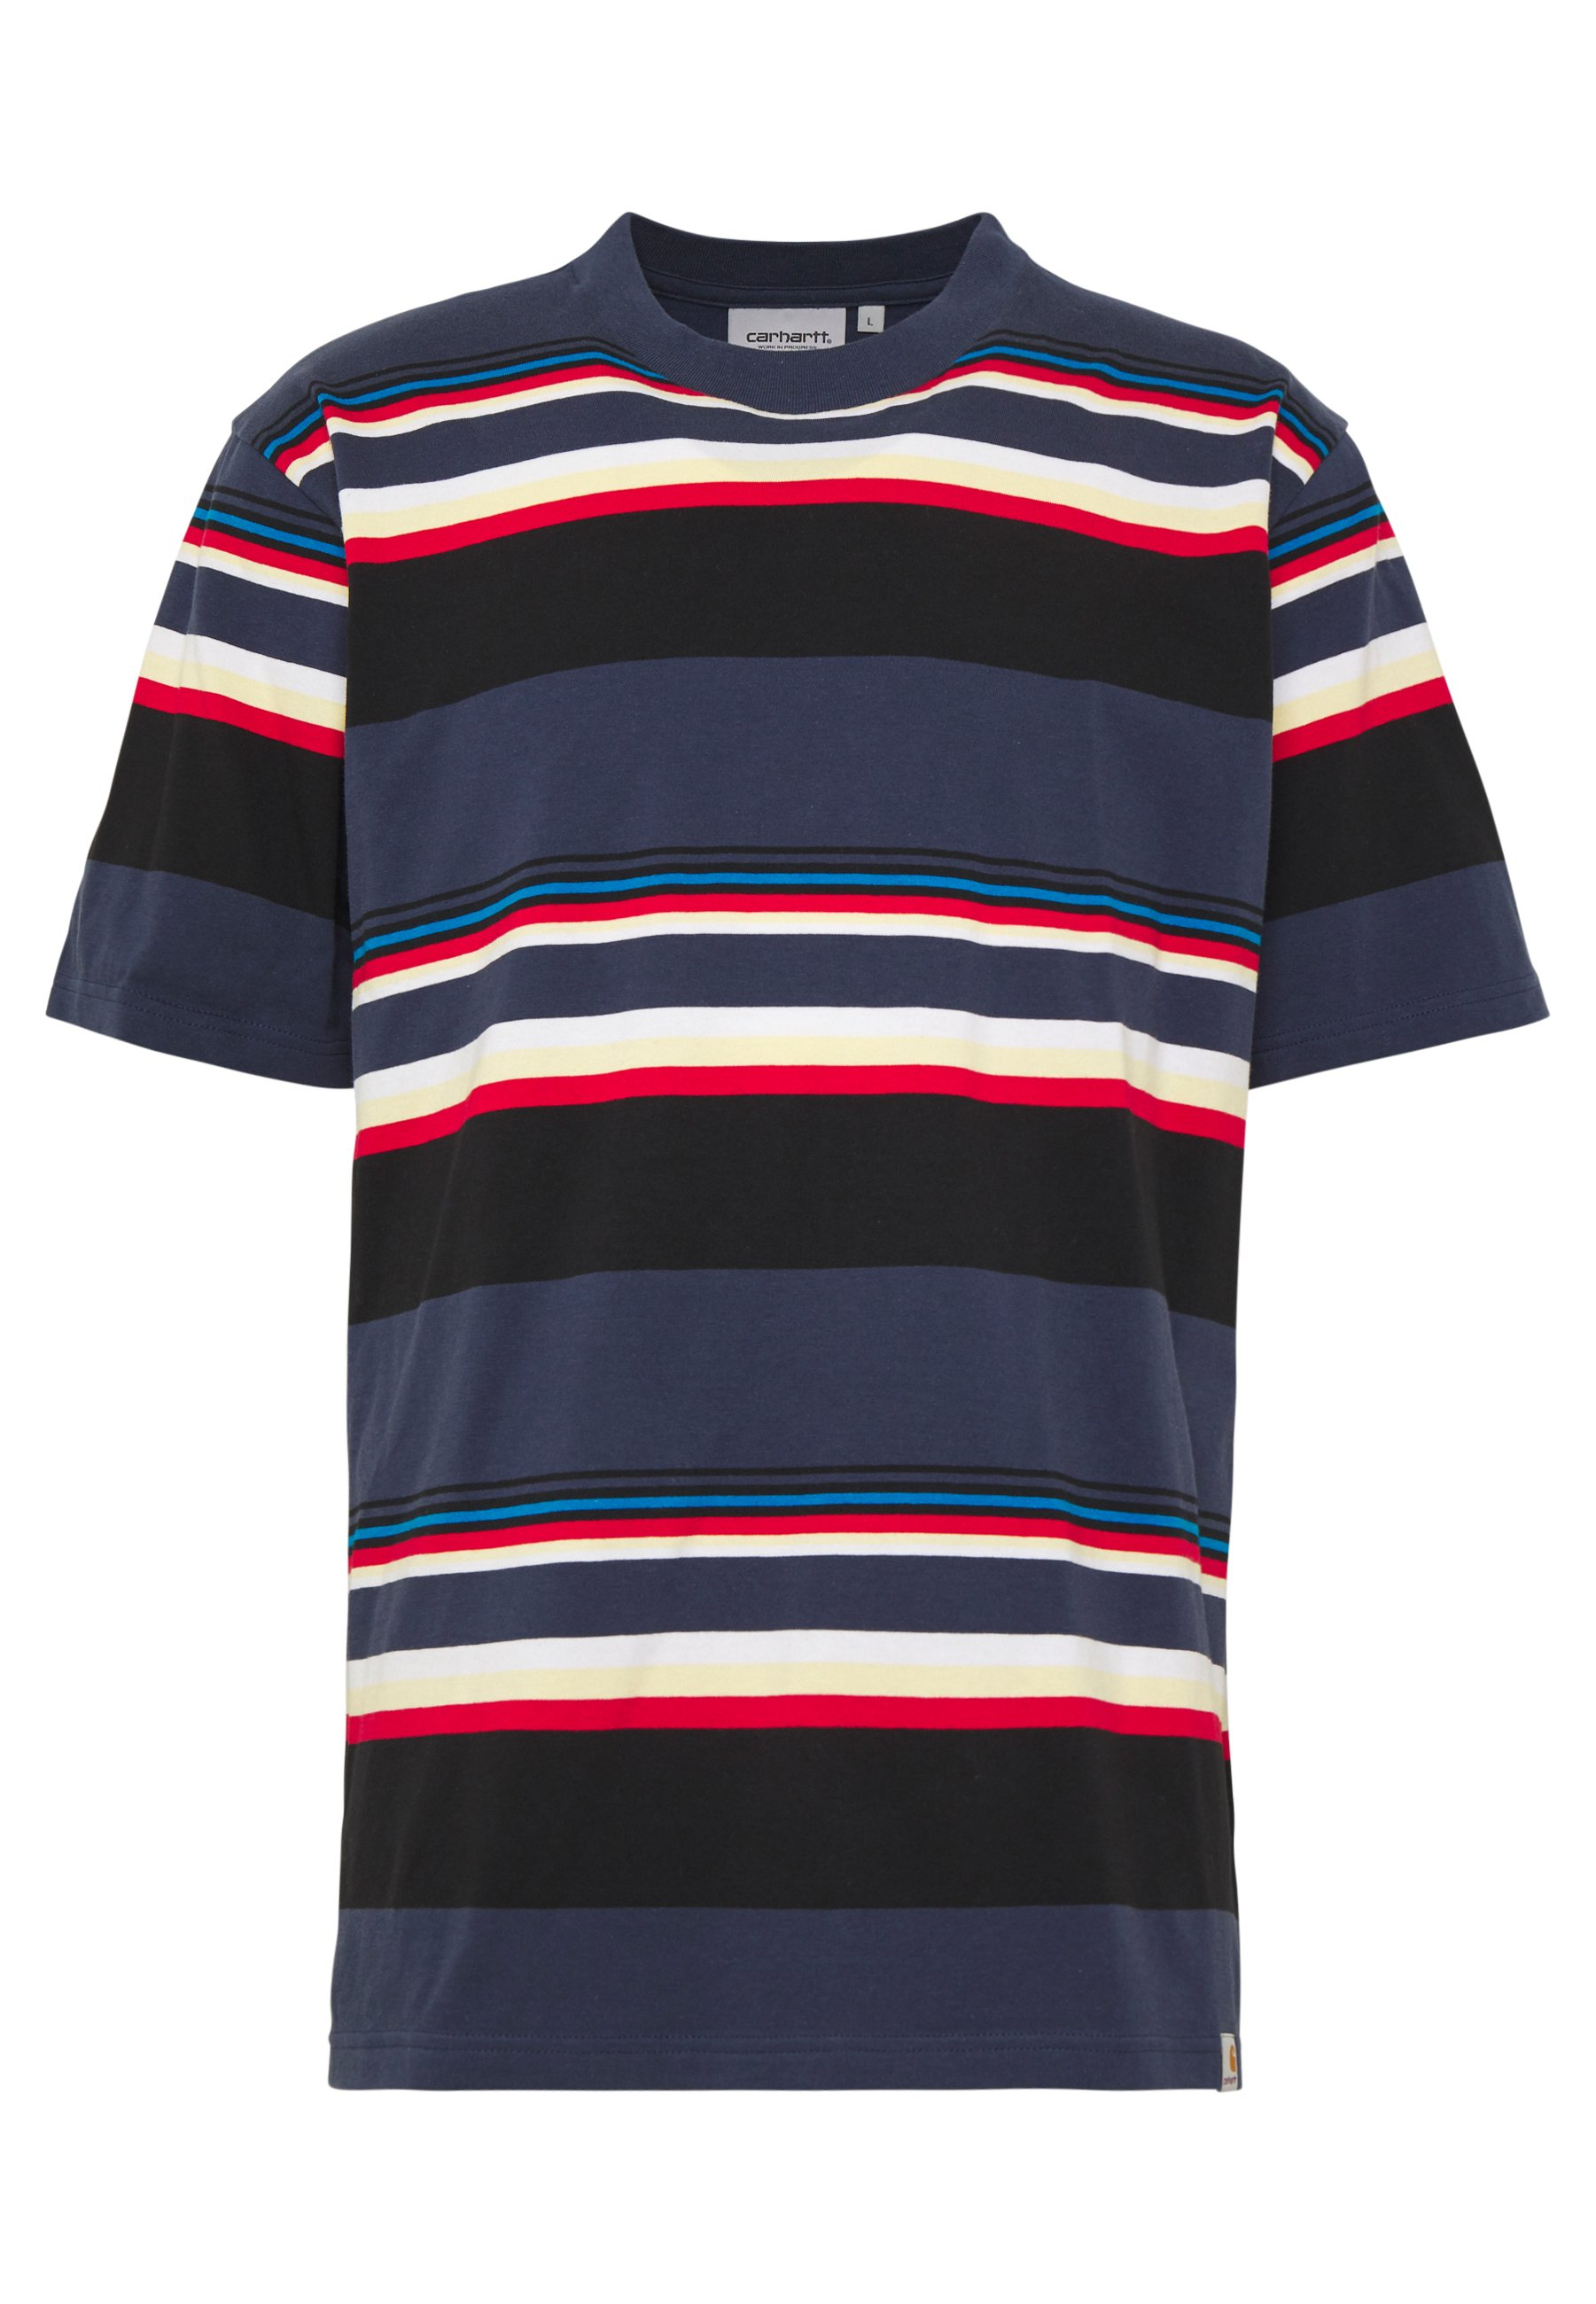 Carhartt Wip Sunder - T-shirts Med Print Blue